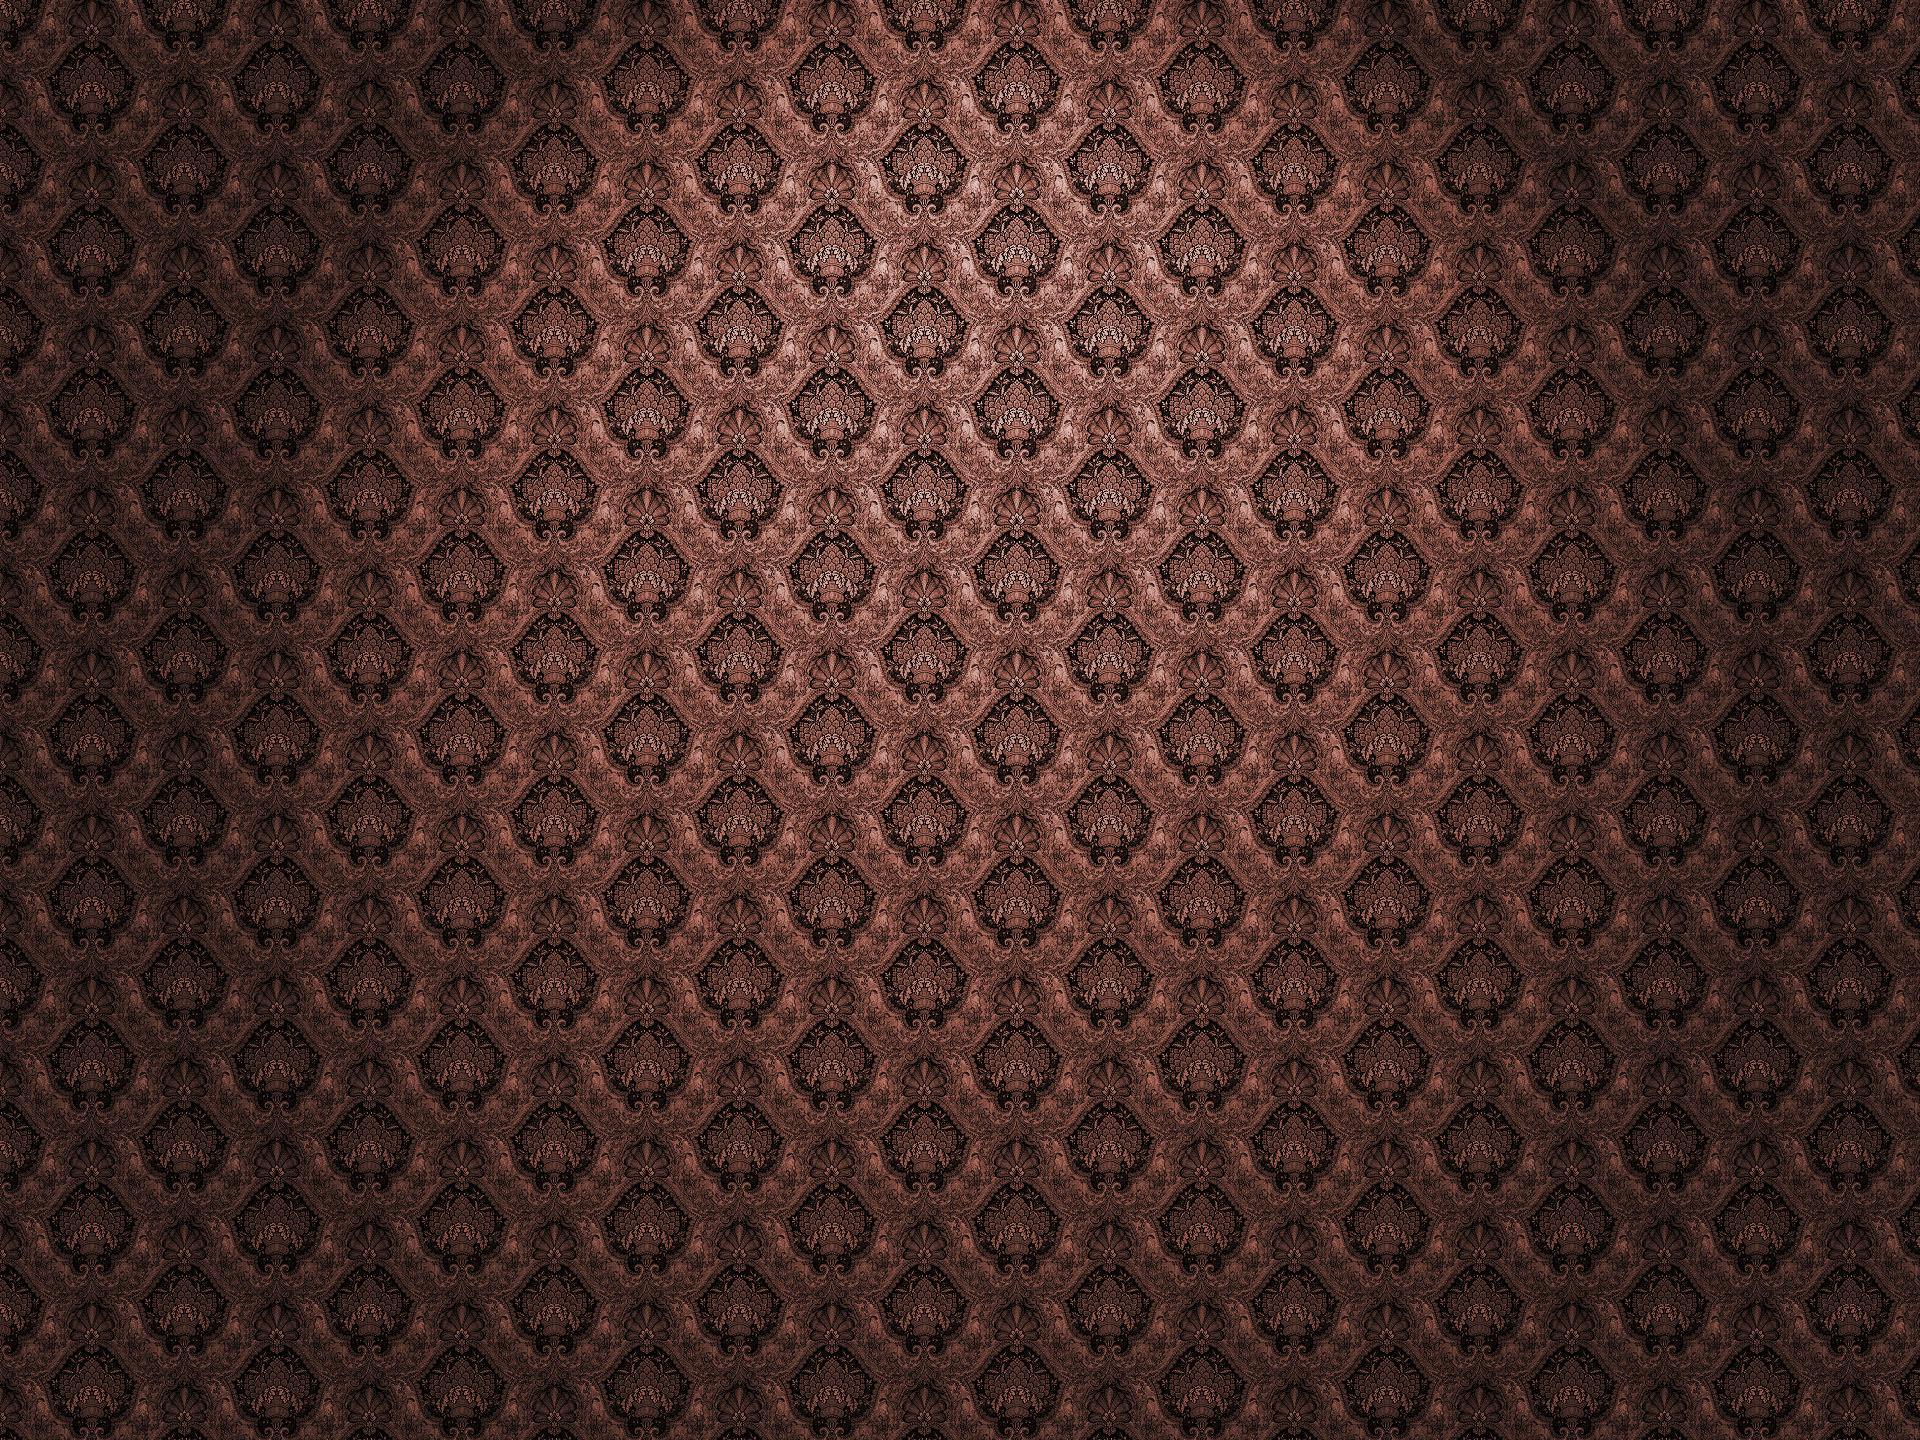 Vintage Patterns Wallpaper 19201440 Vintage Patterns 1920x1440